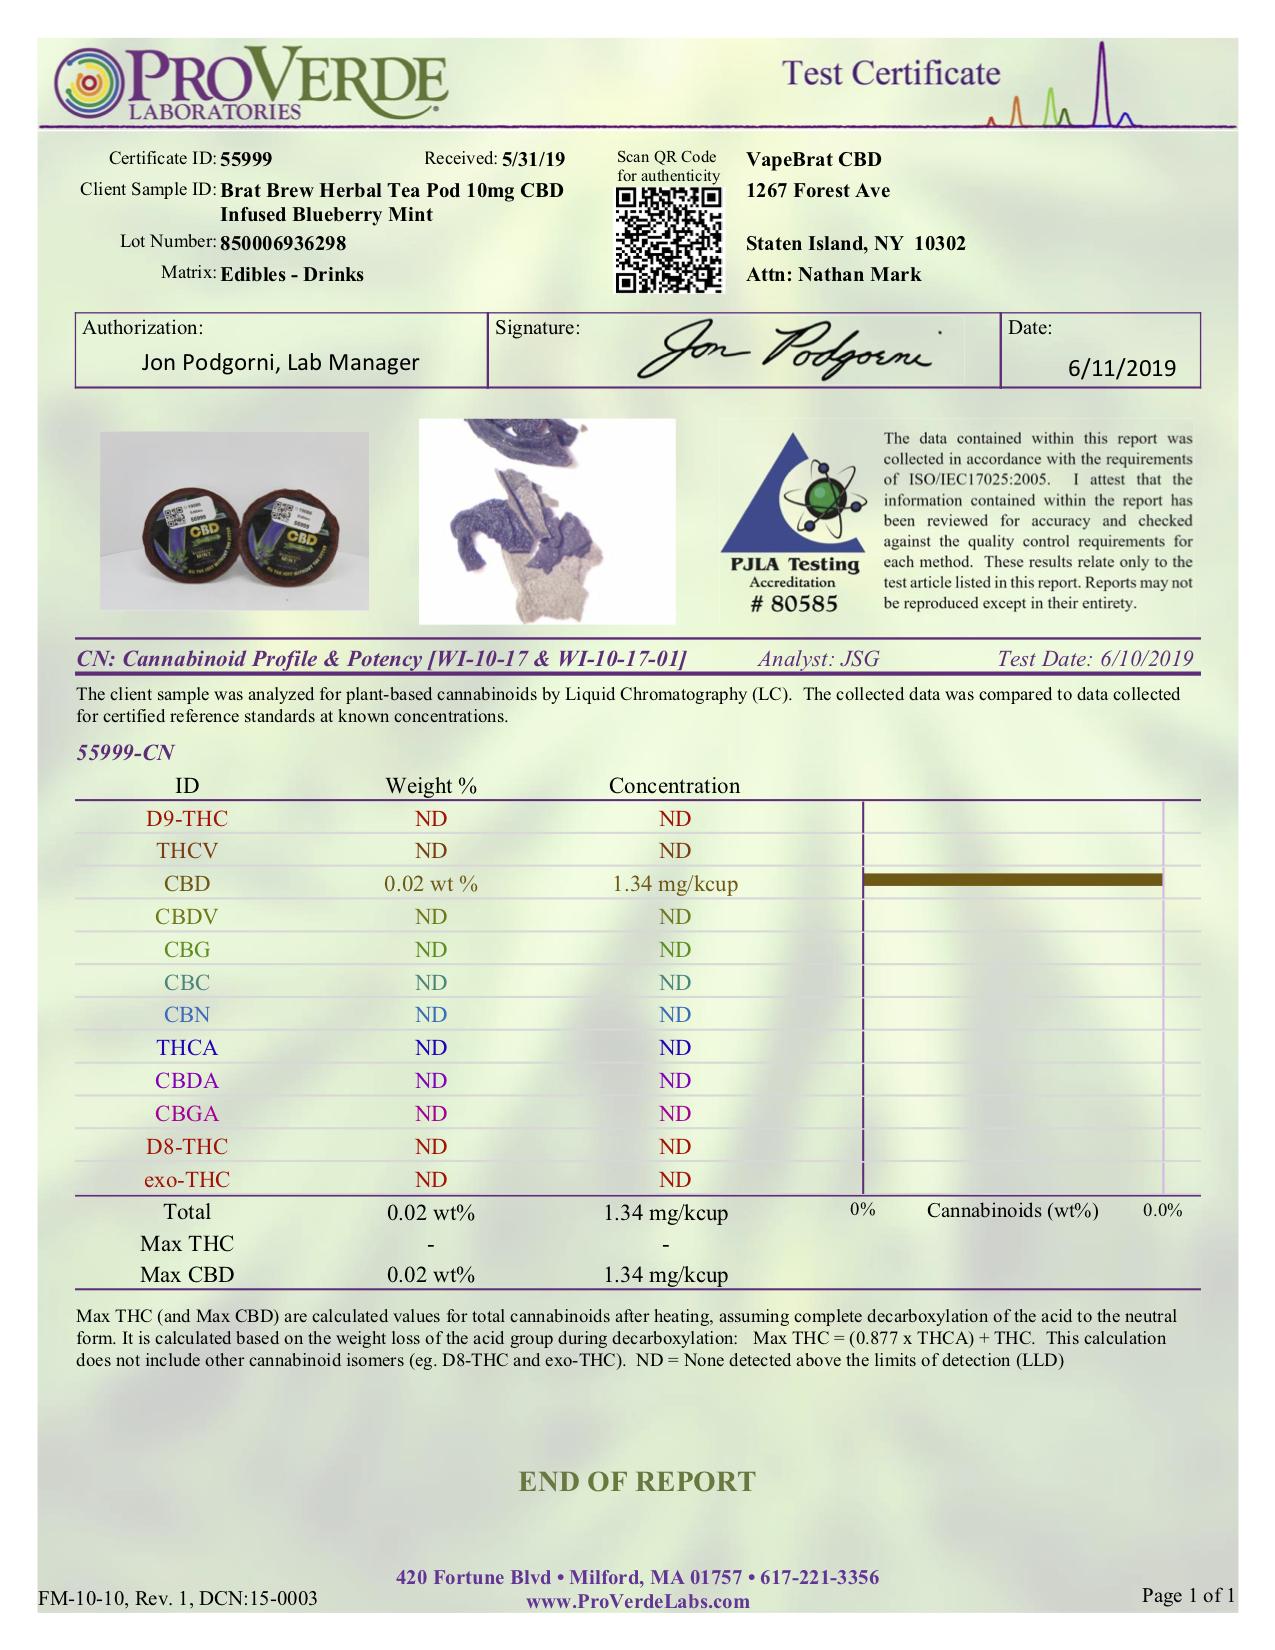 55999-brat-brew-herbal-tea-pod-10mg-cbd-infused-blueberry-mint.jpg